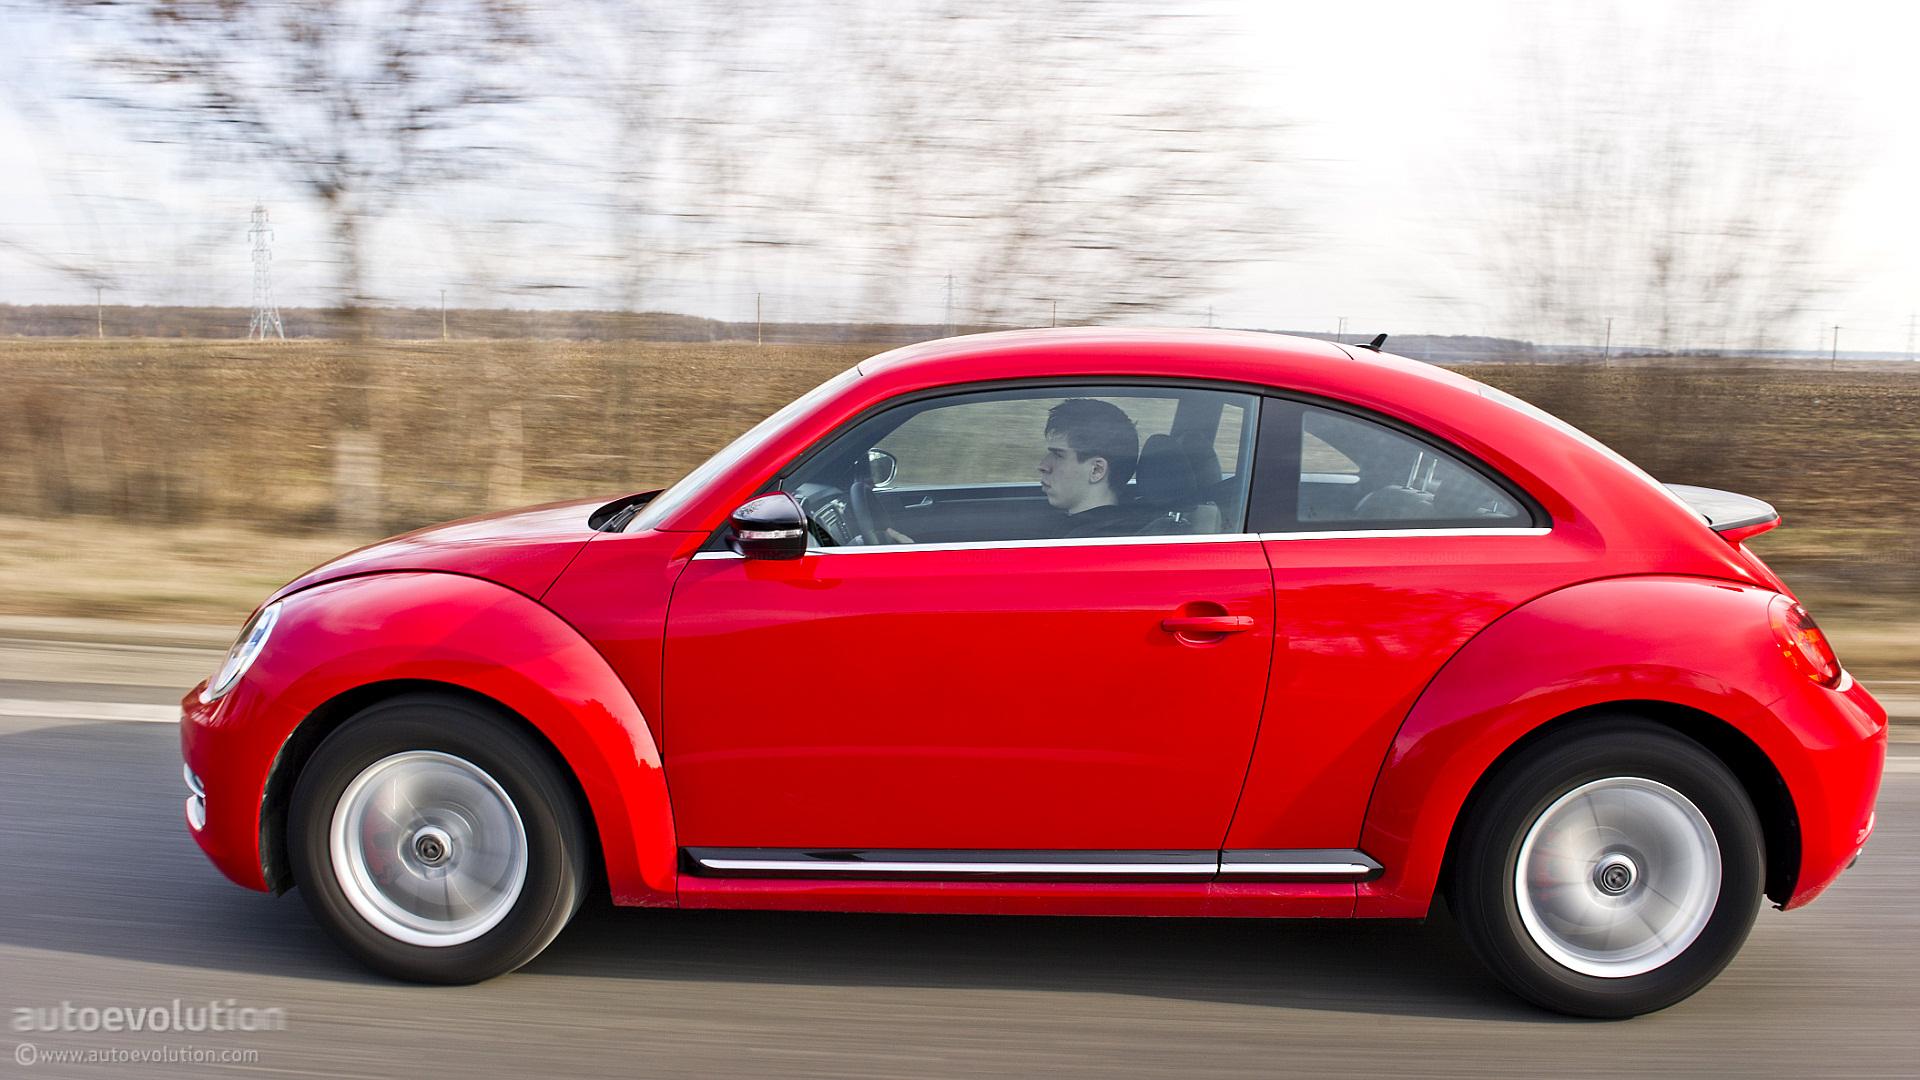 vw beetle review page 2 autoevolution. Black Bedroom Furniture Sets. Home Design Ideas